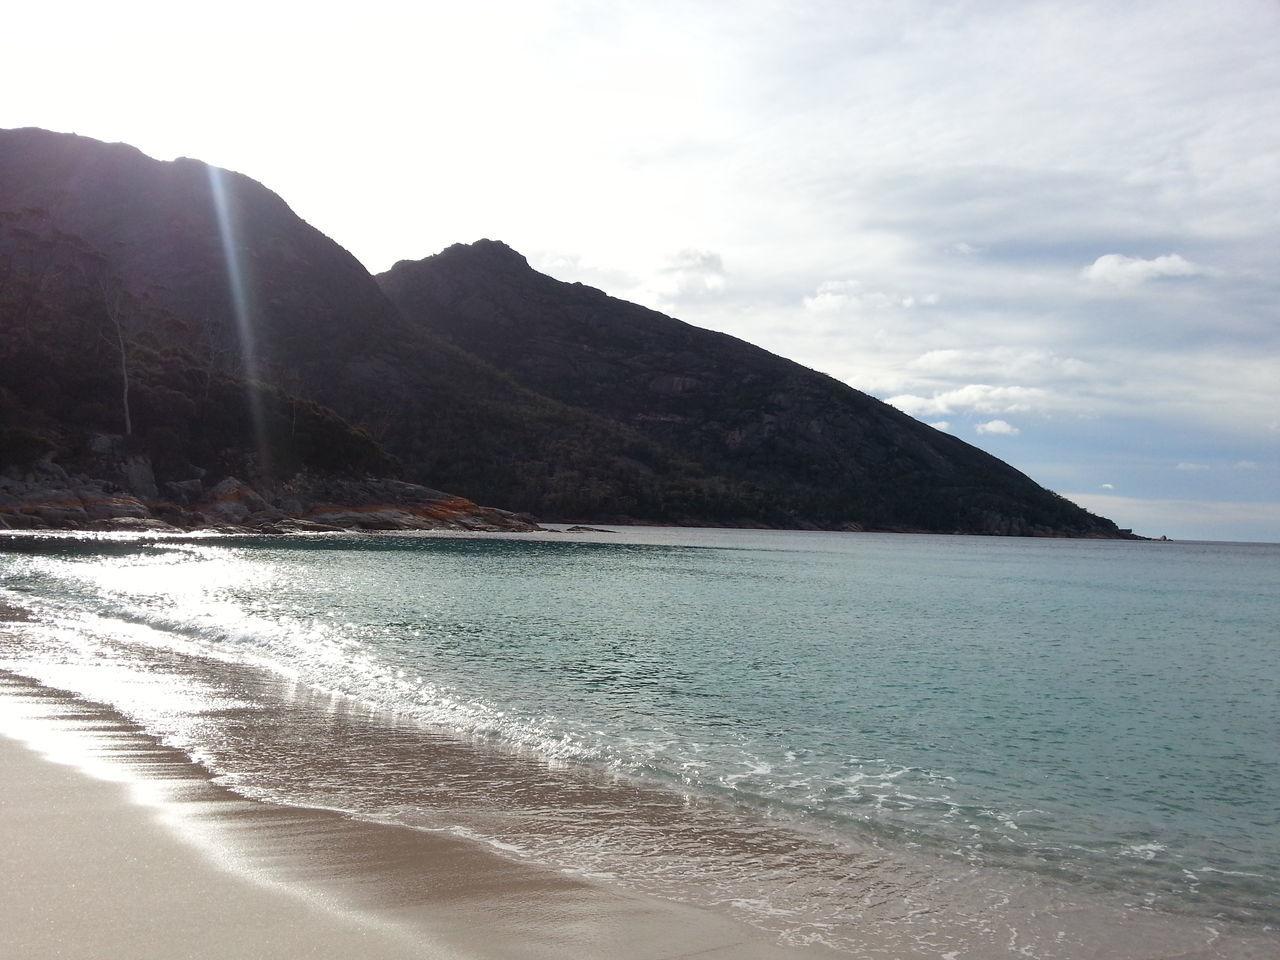 Wineglass Bay Tasmania Australia Worthit White Sand Beach Stunning Nature Beauty In Nature CantWaitToGoBack